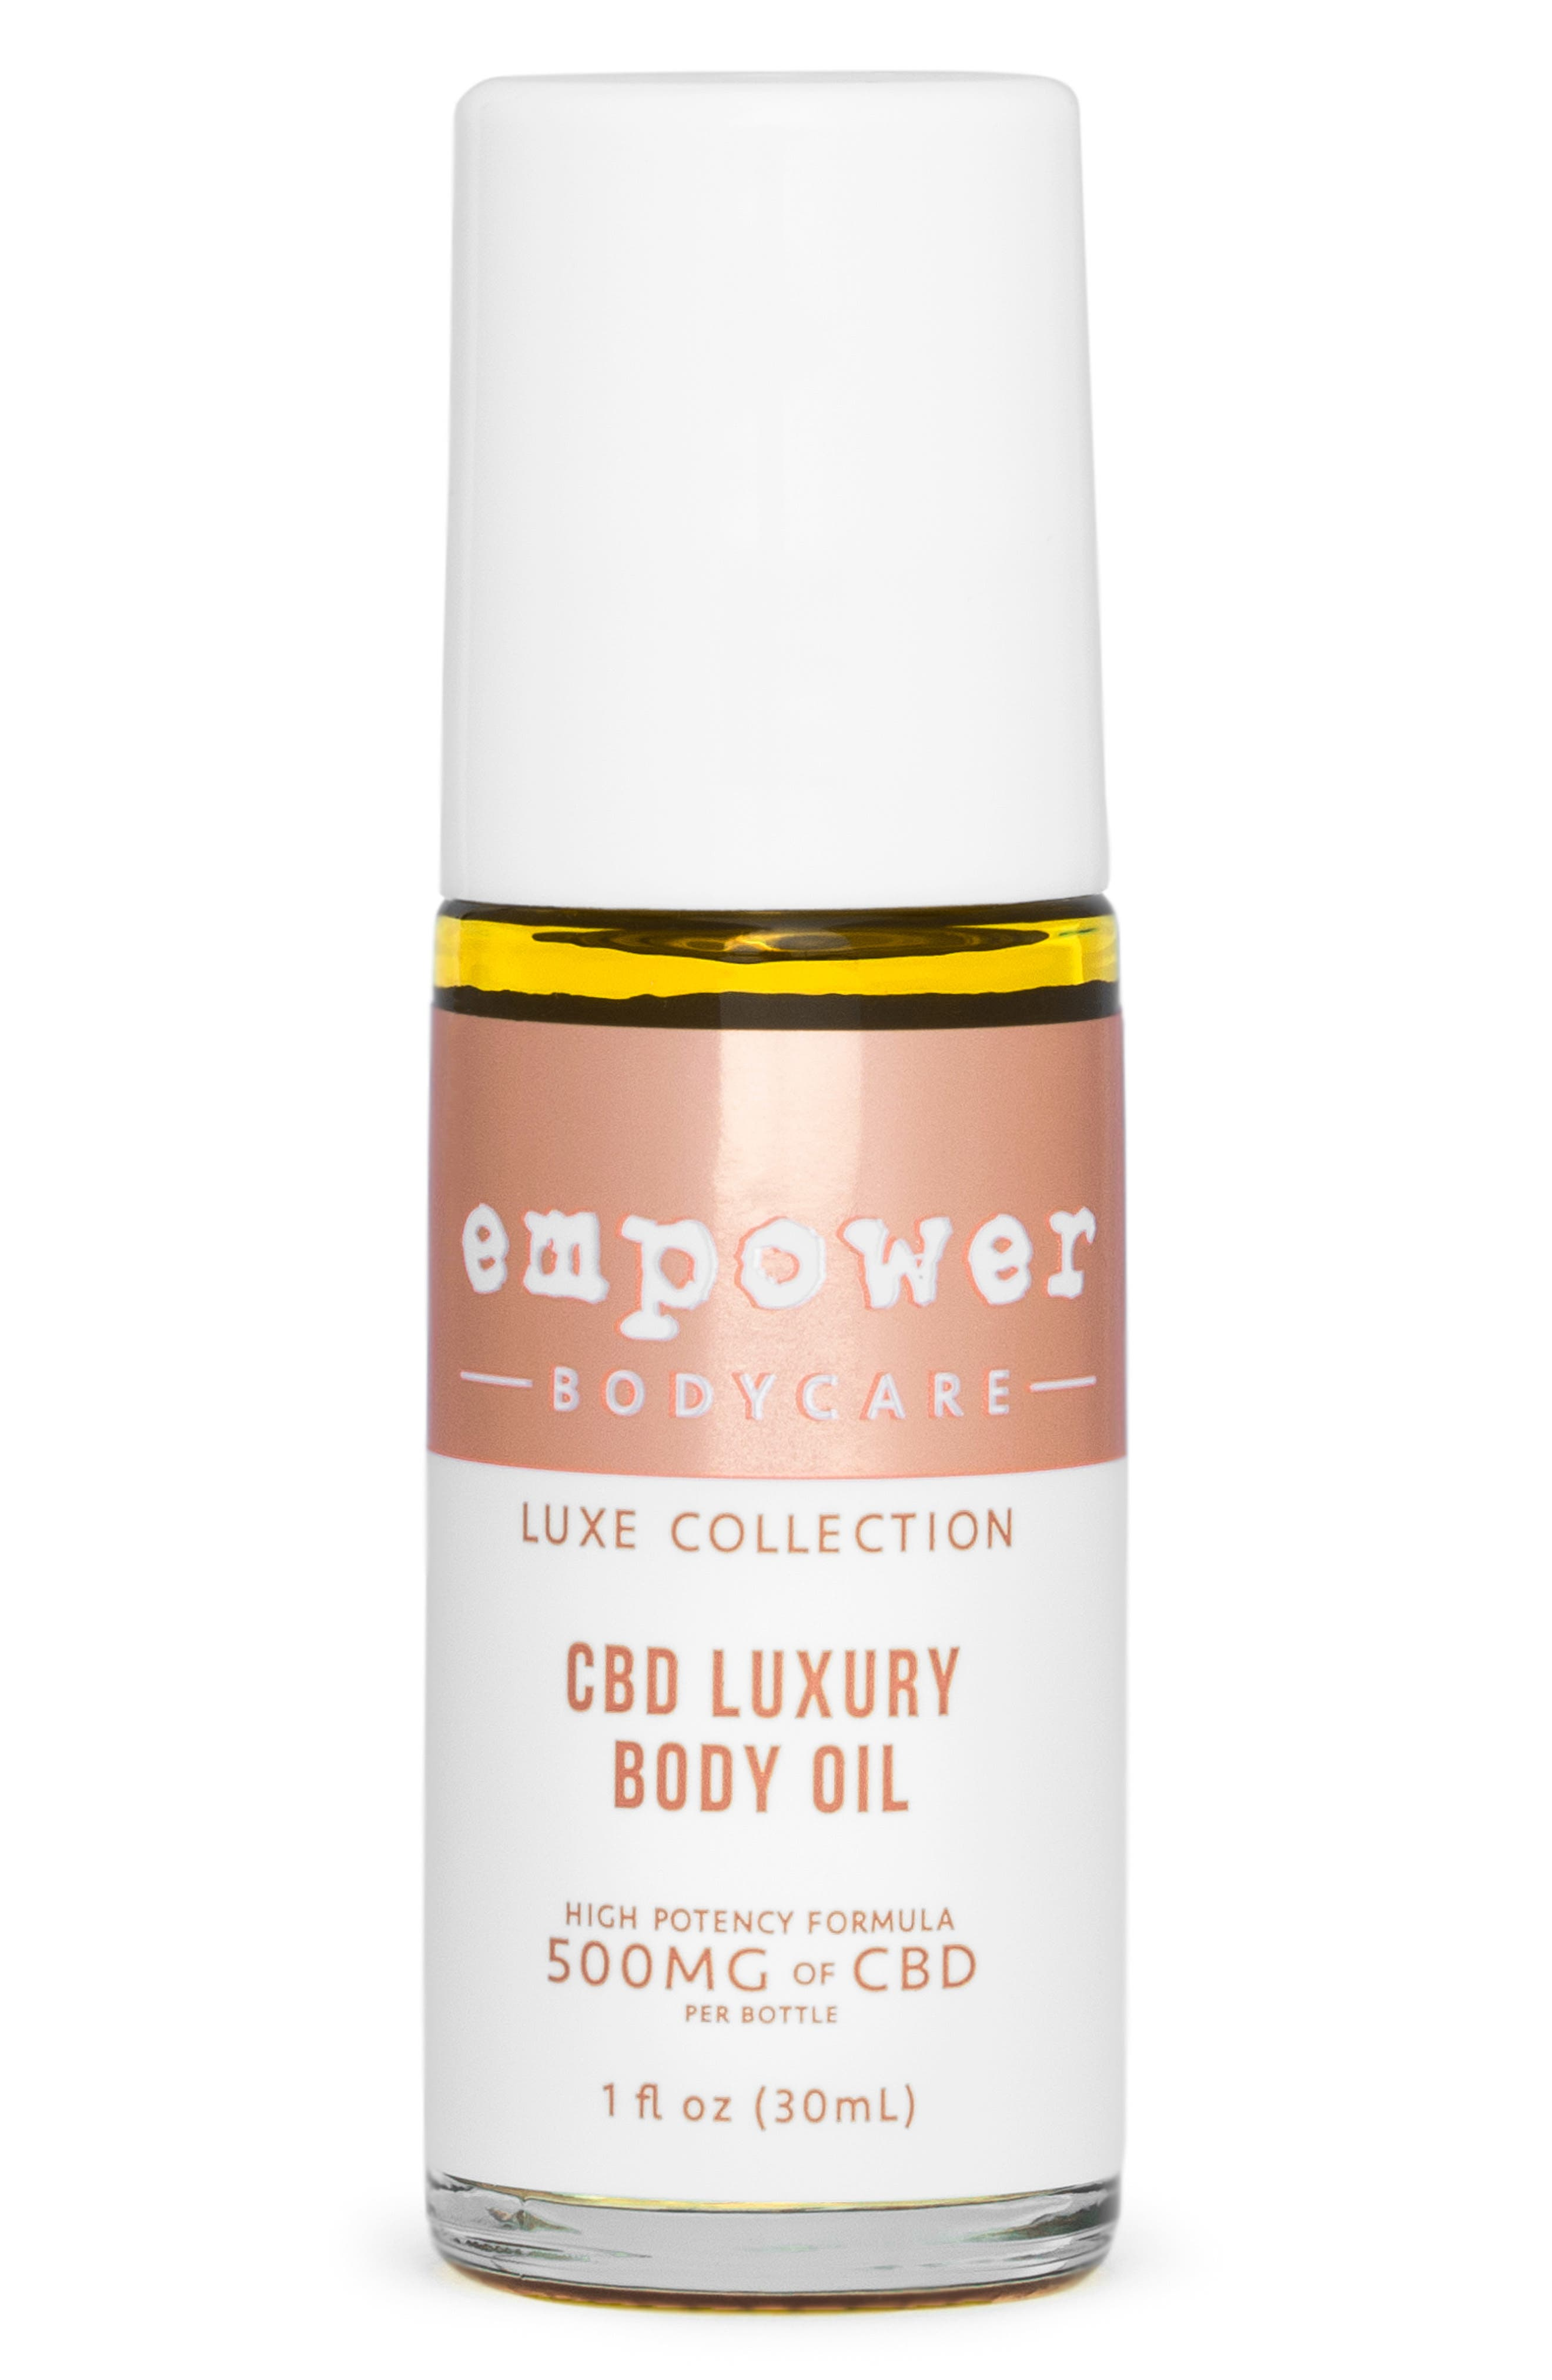 CBD Luxury Body Oil in No Color at Nordstrom